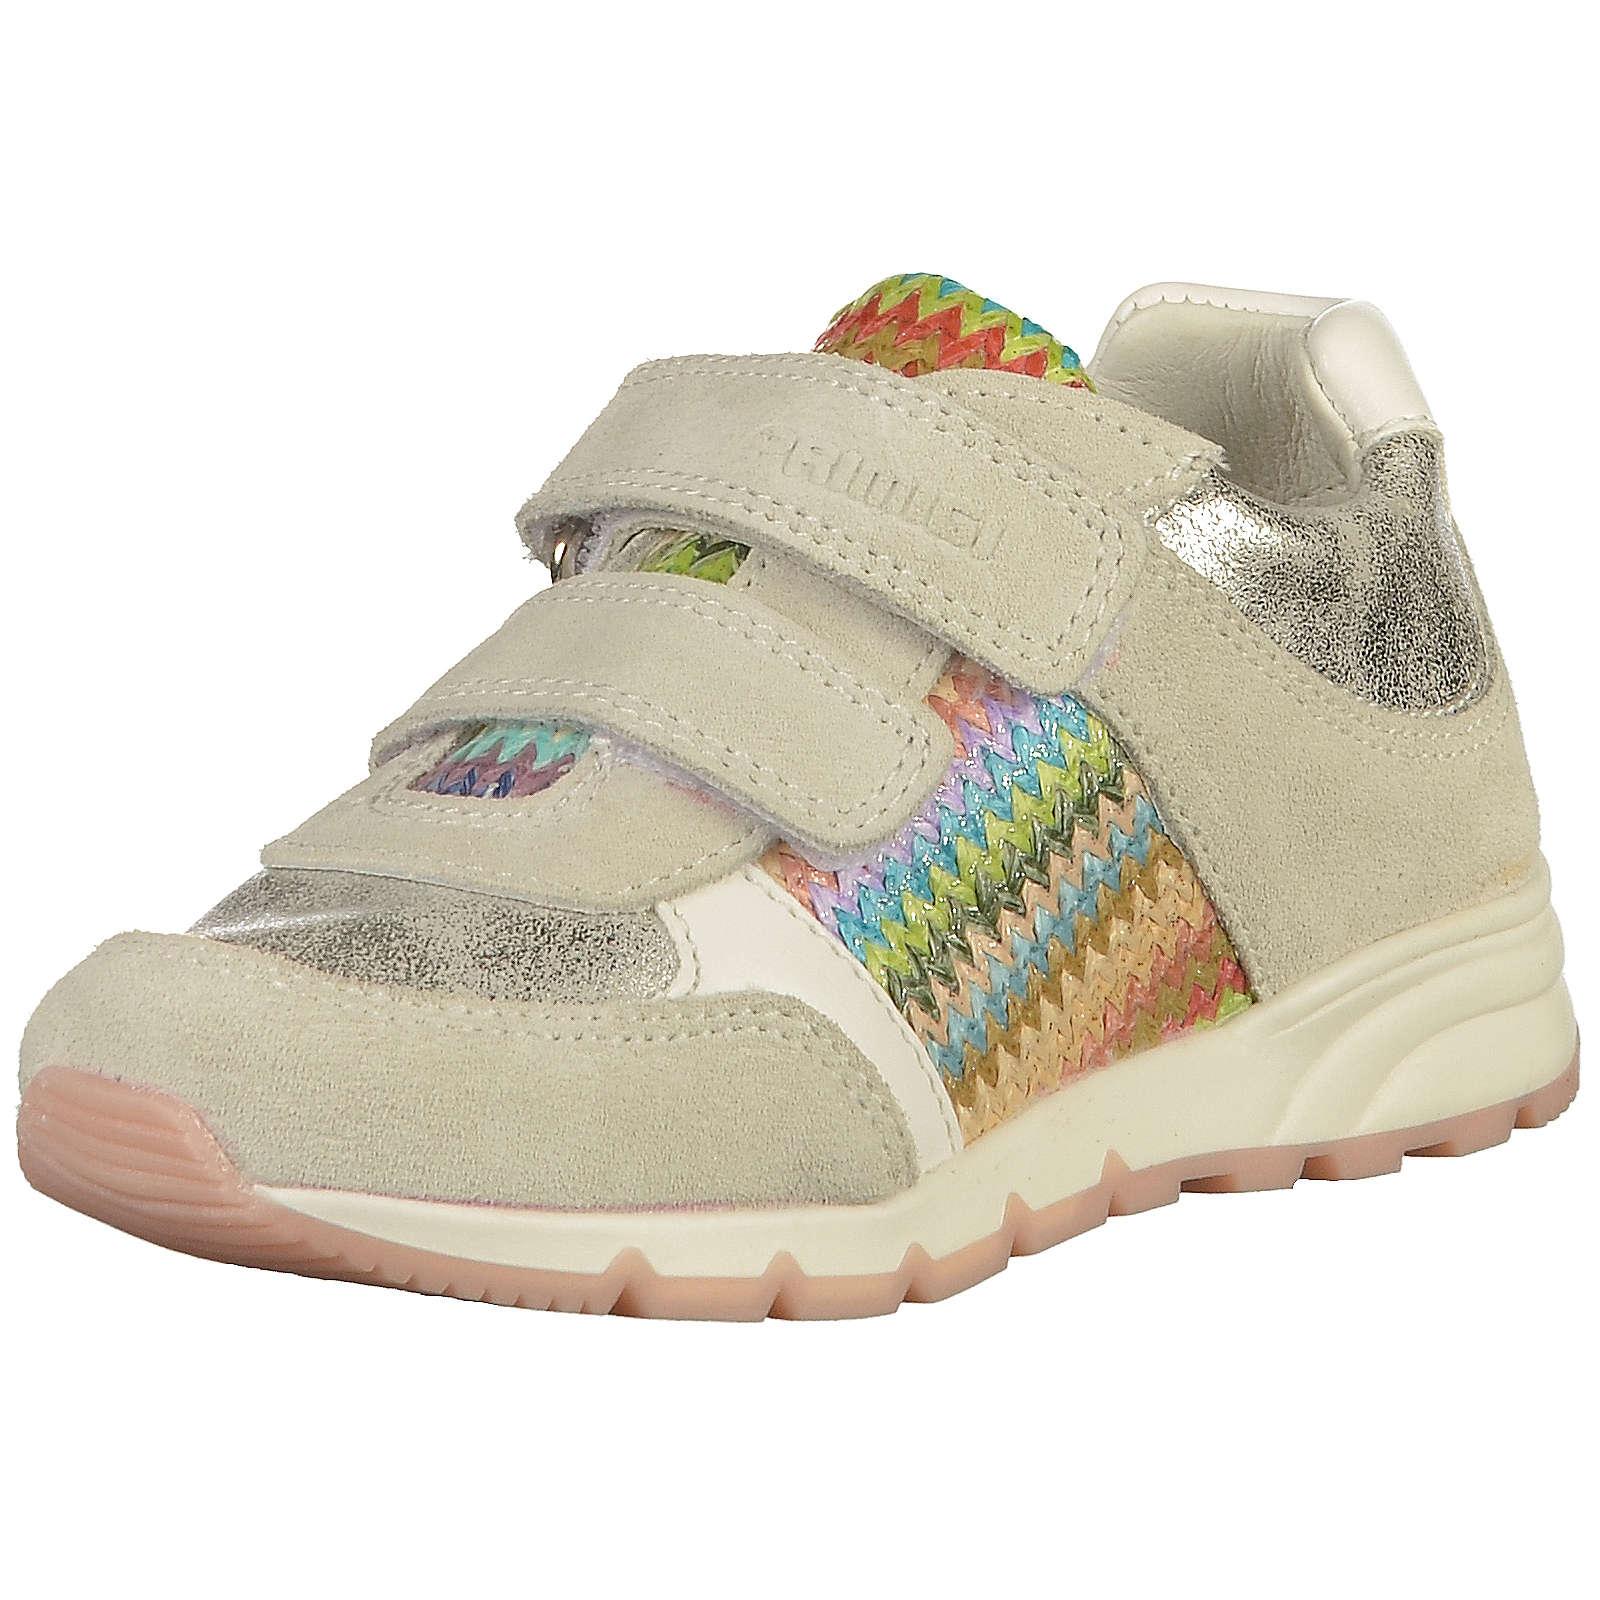 PRIMIGI Baby Sneakers Low für Jungen grau Junge Gr. 25